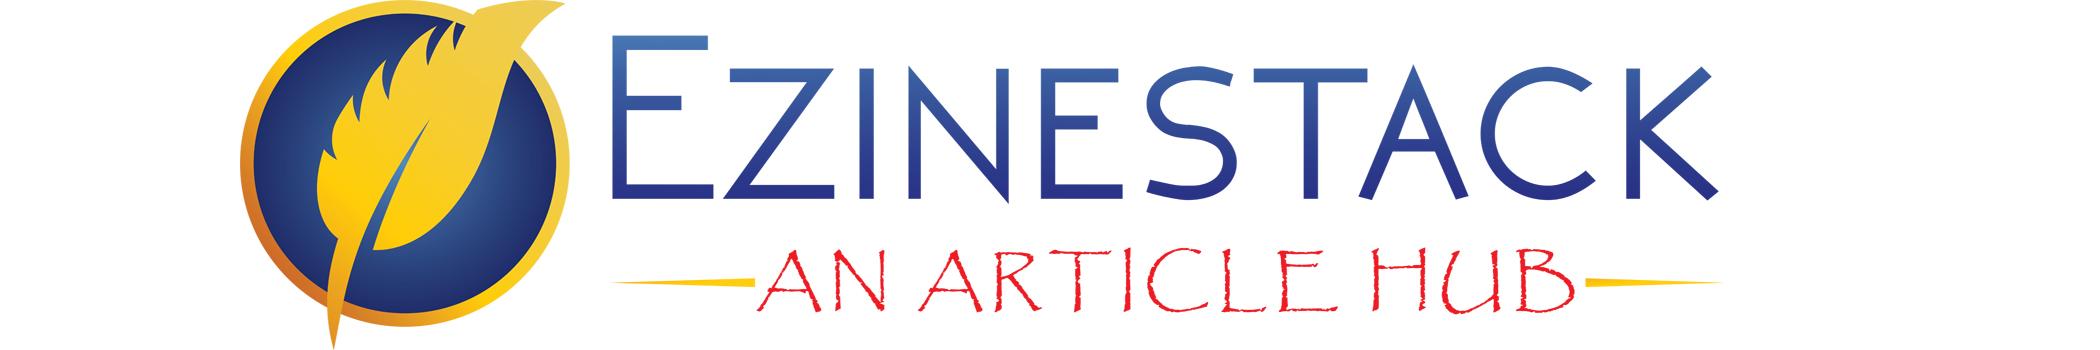 Ezinestack_Logo